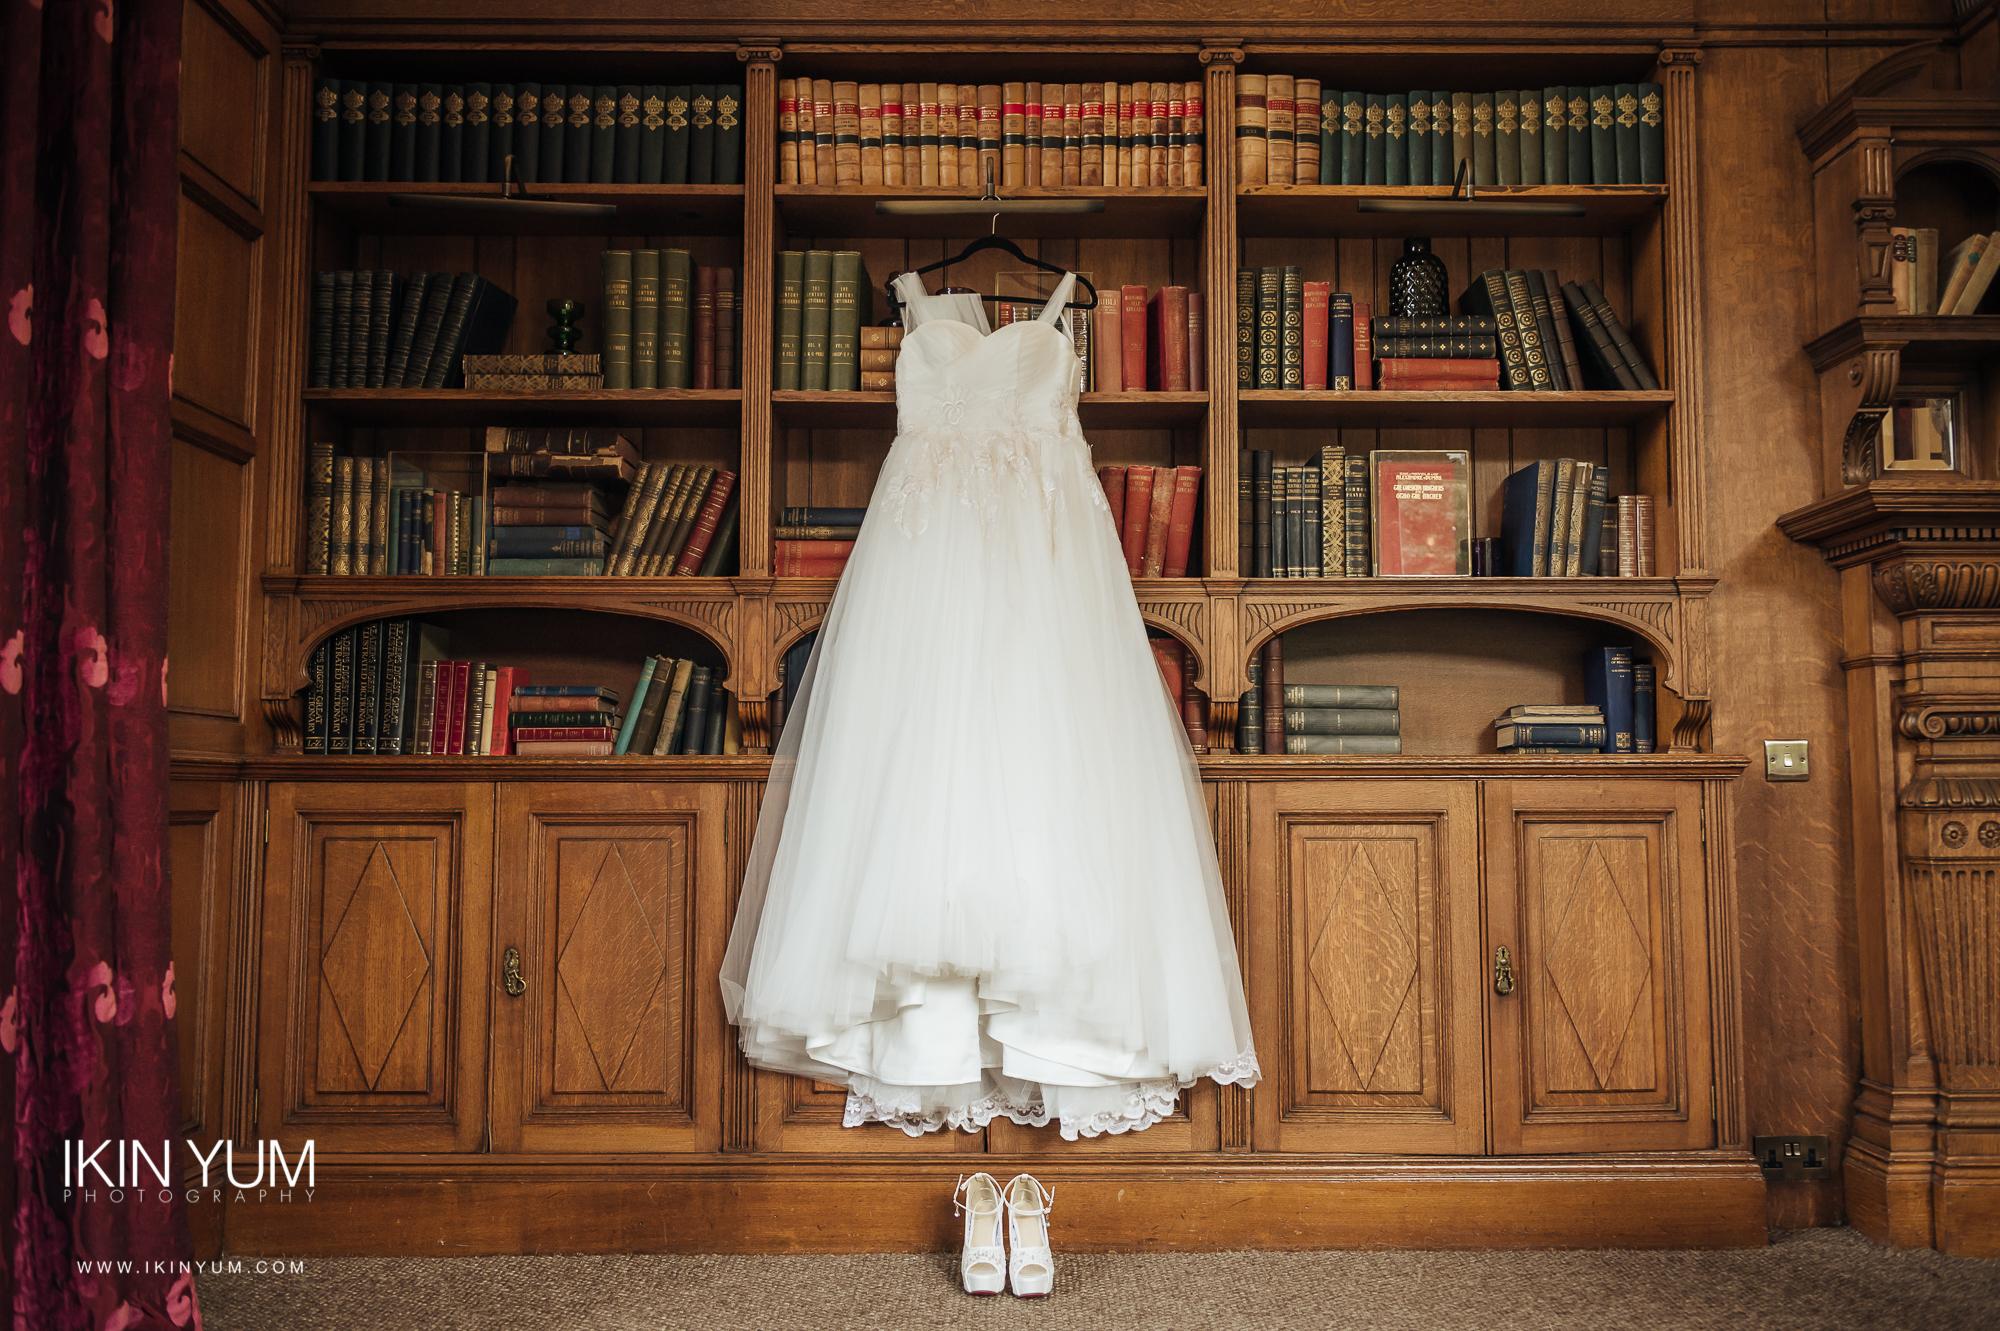 Hampton Manor Wedding - Ikin Yum Photography -044.jpg